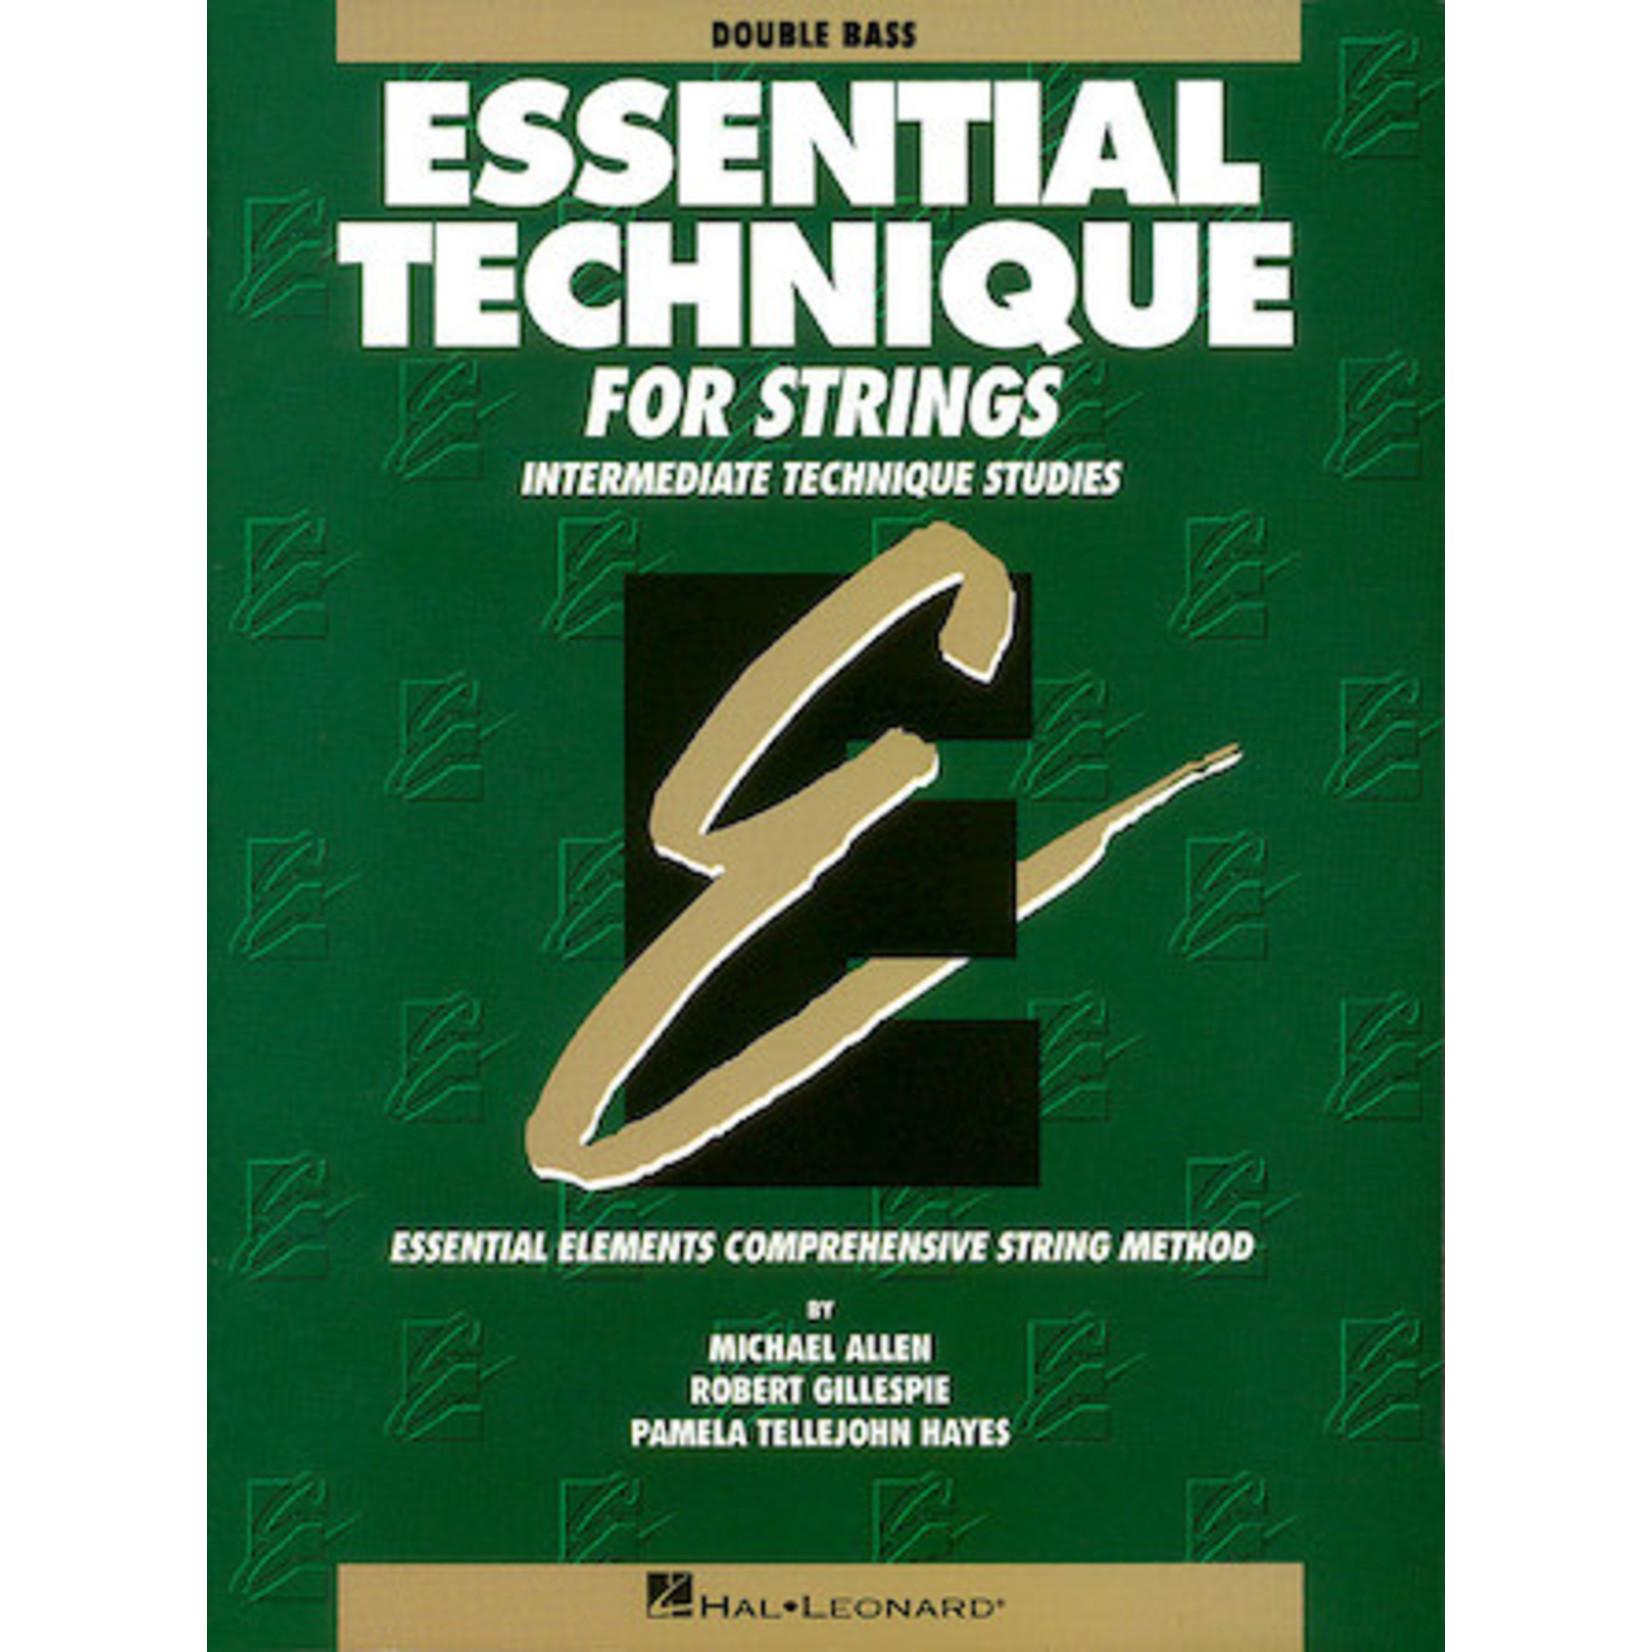 Hal Leonard Essential Technique for Strings - Double Bass (Original Series)